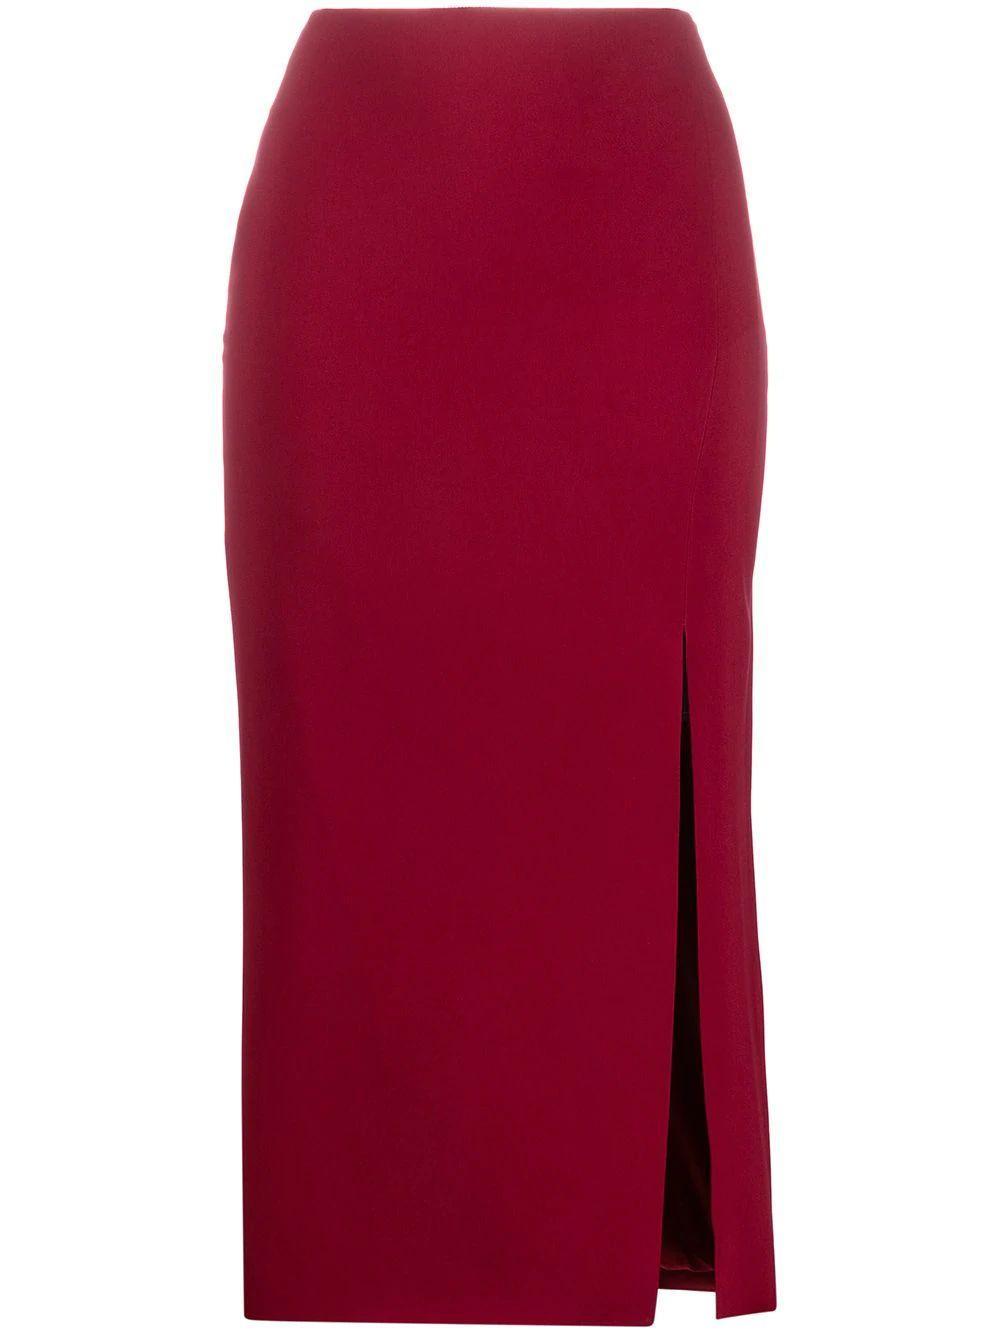 Side Slit Pencil Skirt Item # VB3RA77065C